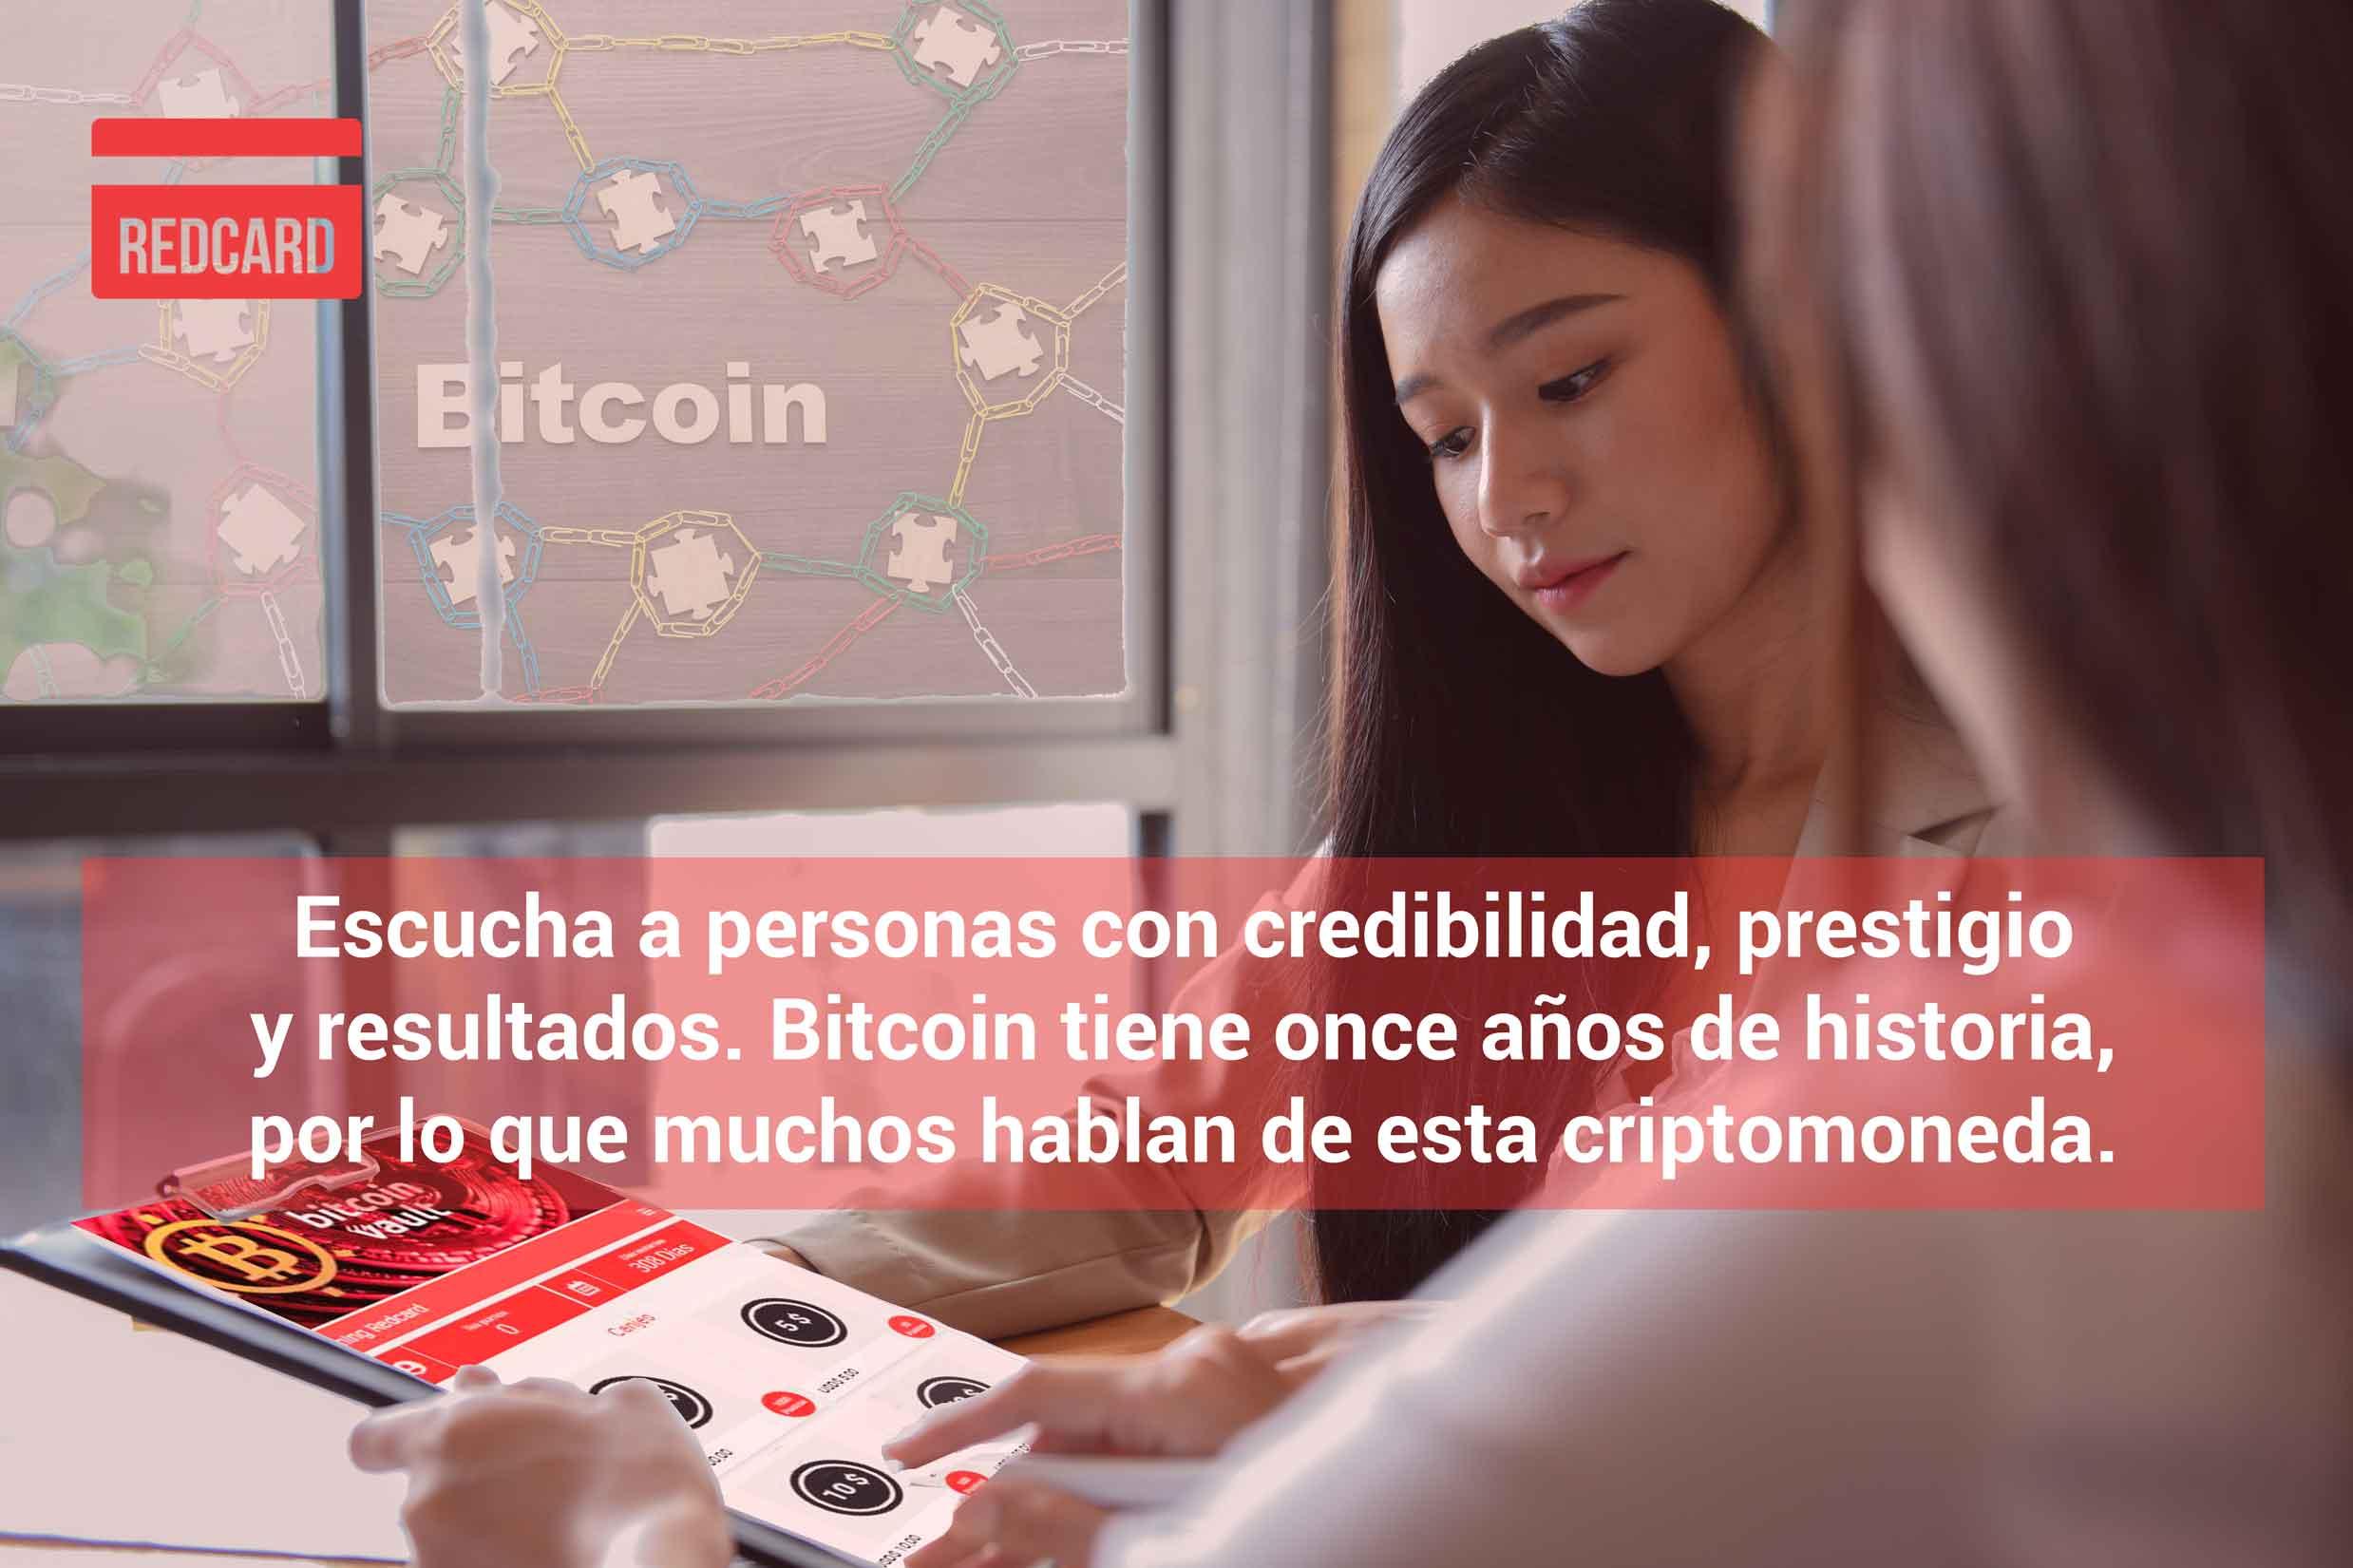 Qué hace Redcard para poder minar bitcoin vault